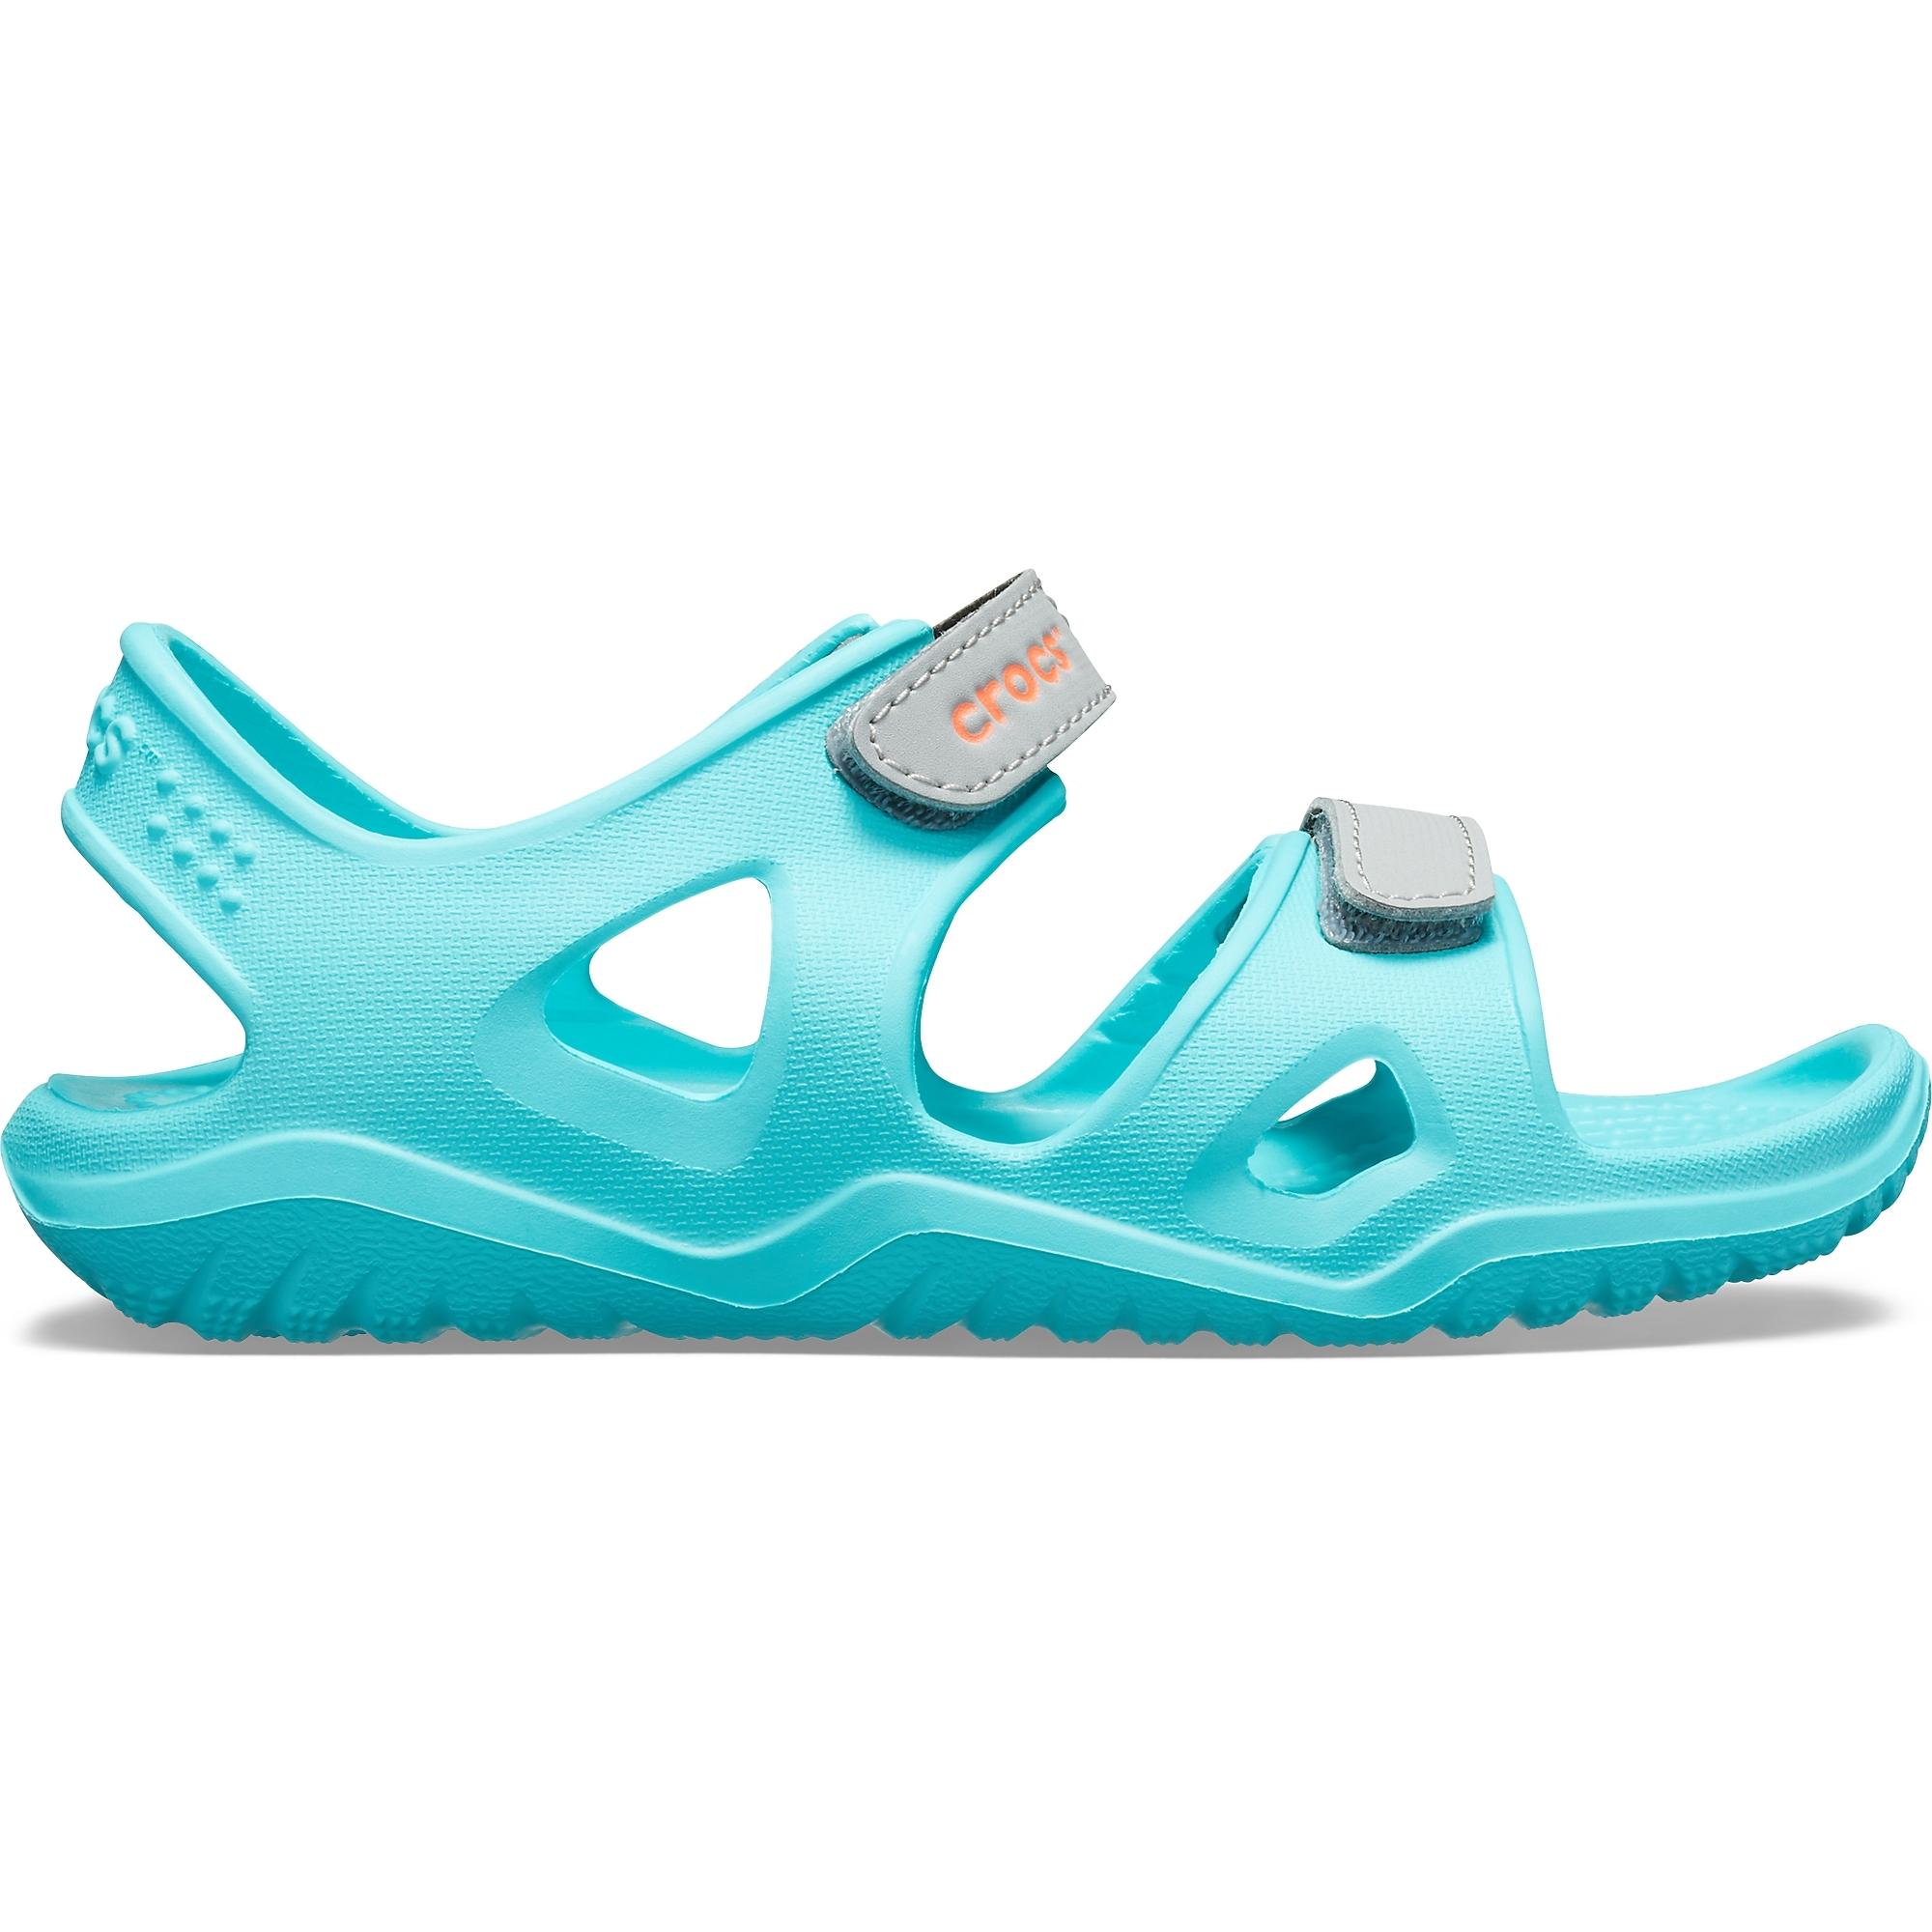 Sandal Sandals Crocs Kids Rl3jq5ac4 River Swiftwater Poolshuperb 204988 SUqzGpMV